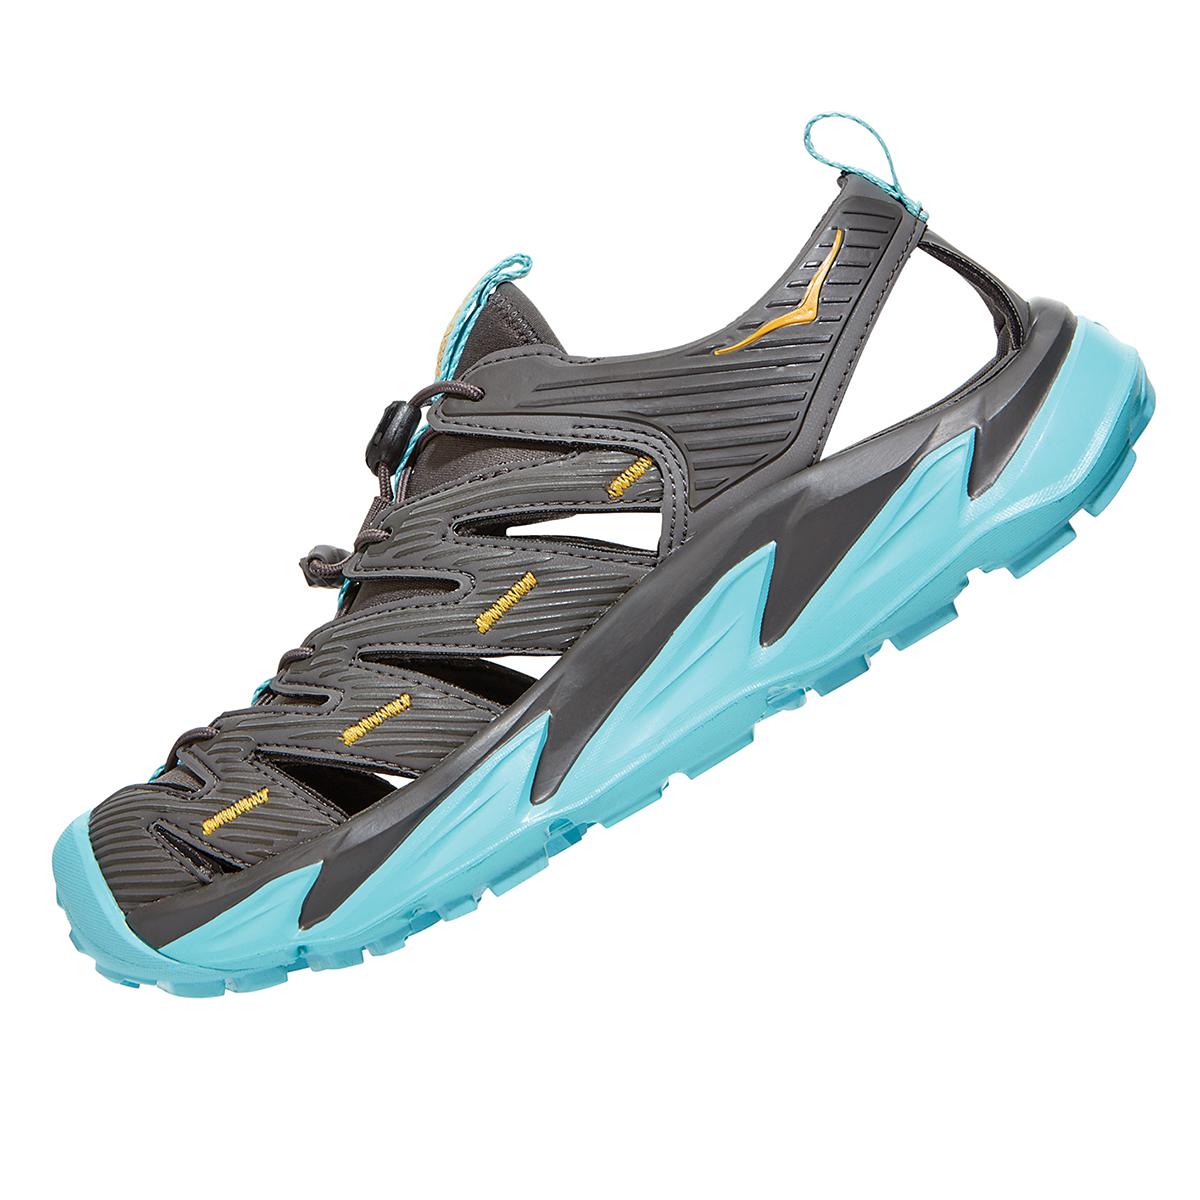 Women's Hoka One One Hopara Hiking Shoe - Color: Dark Gull Grey/Antigua Sand - Size: 5 - Width: Regular, Dark Gull Grey/Antigua Sand, large, image 4